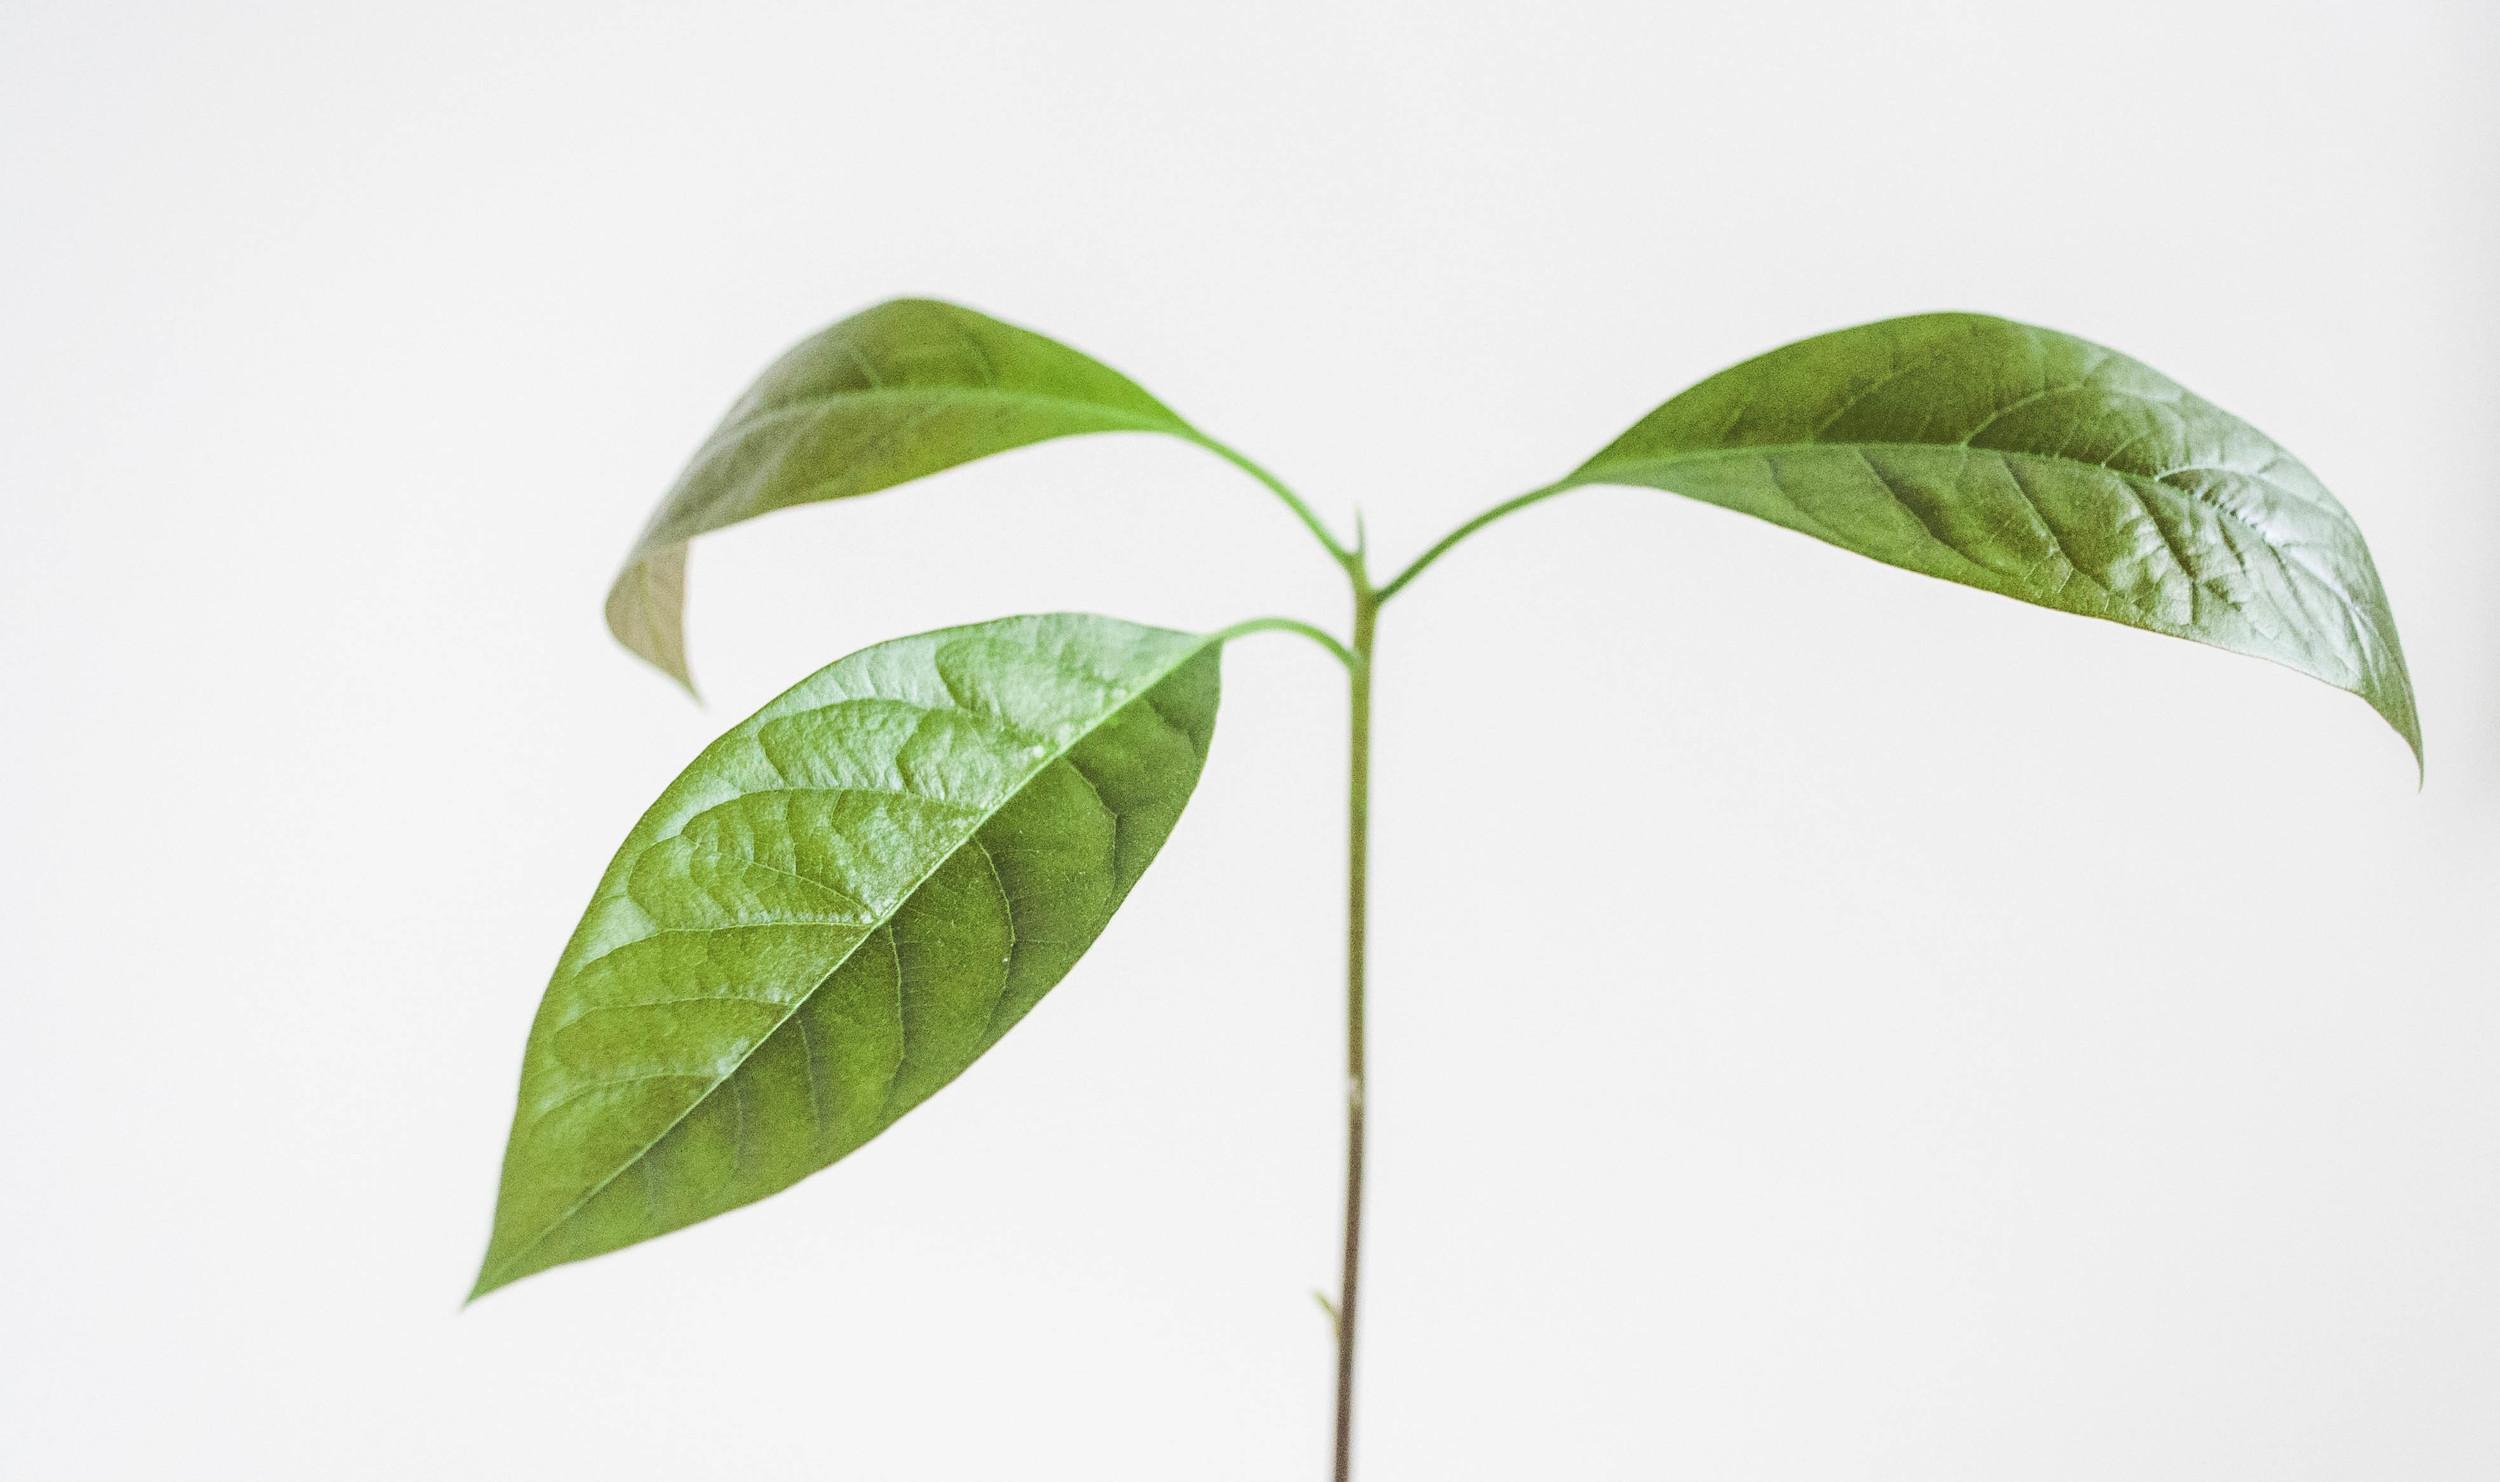 How to Grow and Avocado Tree